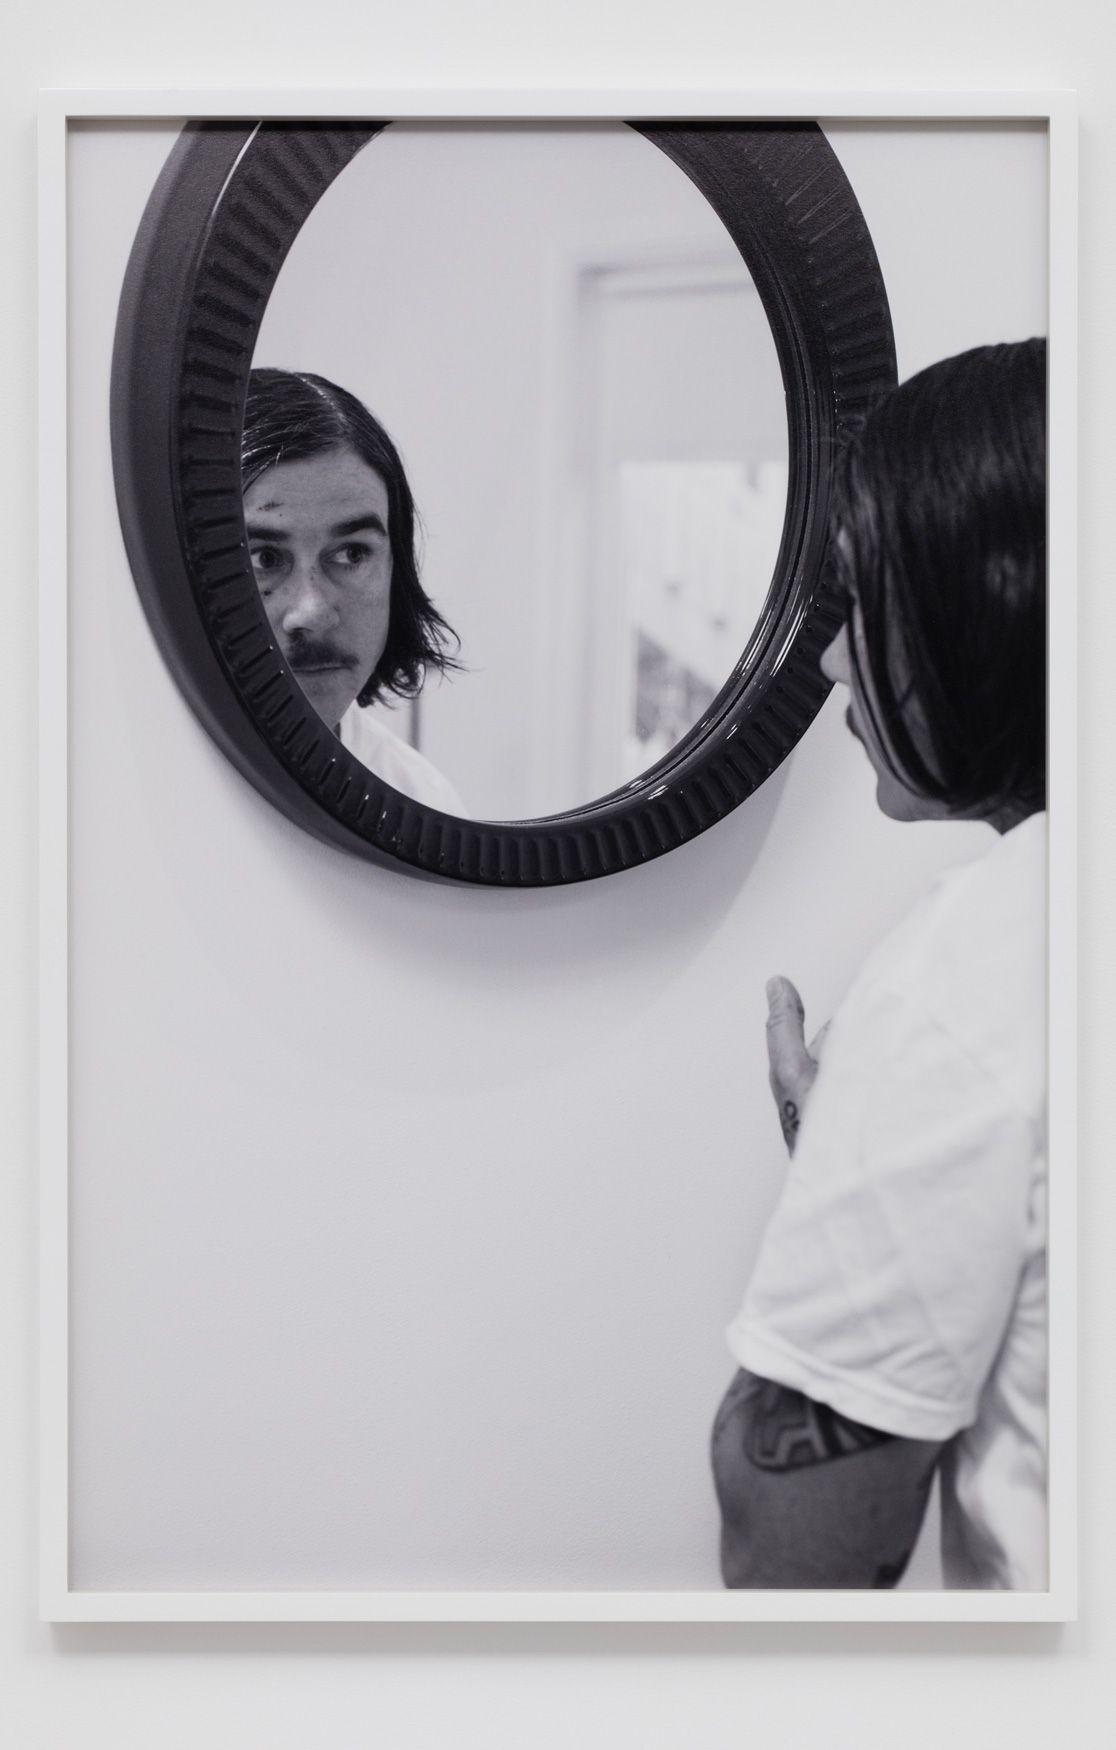 CATHERINE OPIE, Mirror #1 (The Modernist), 2016